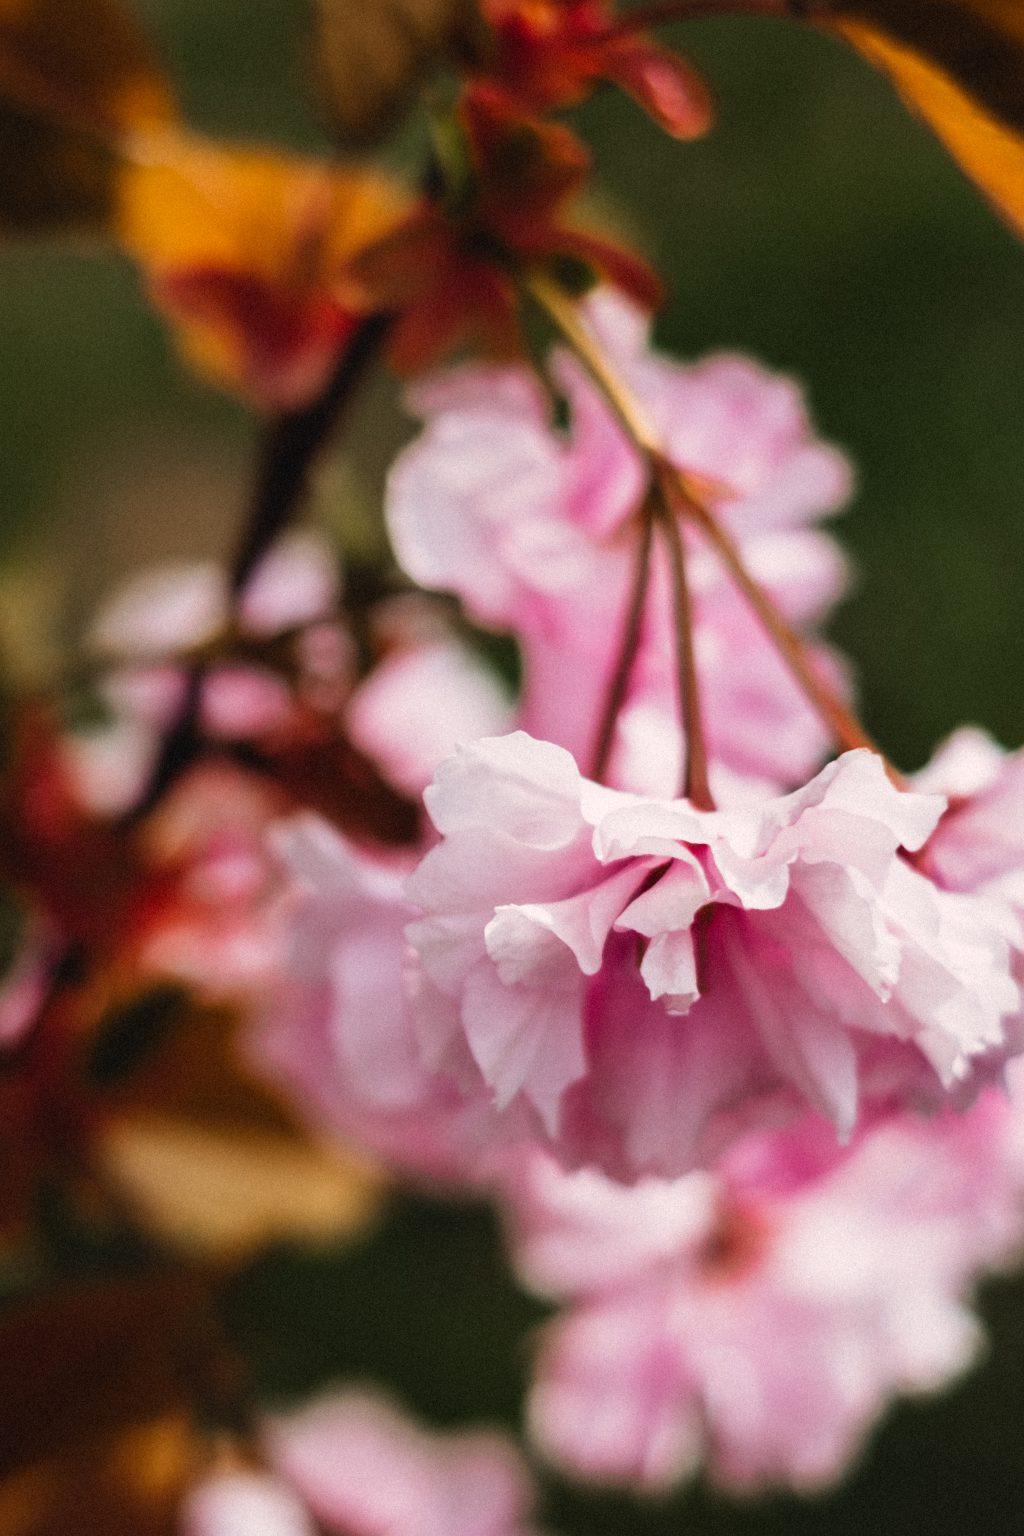 Cherry blossom closeup - free stock photo